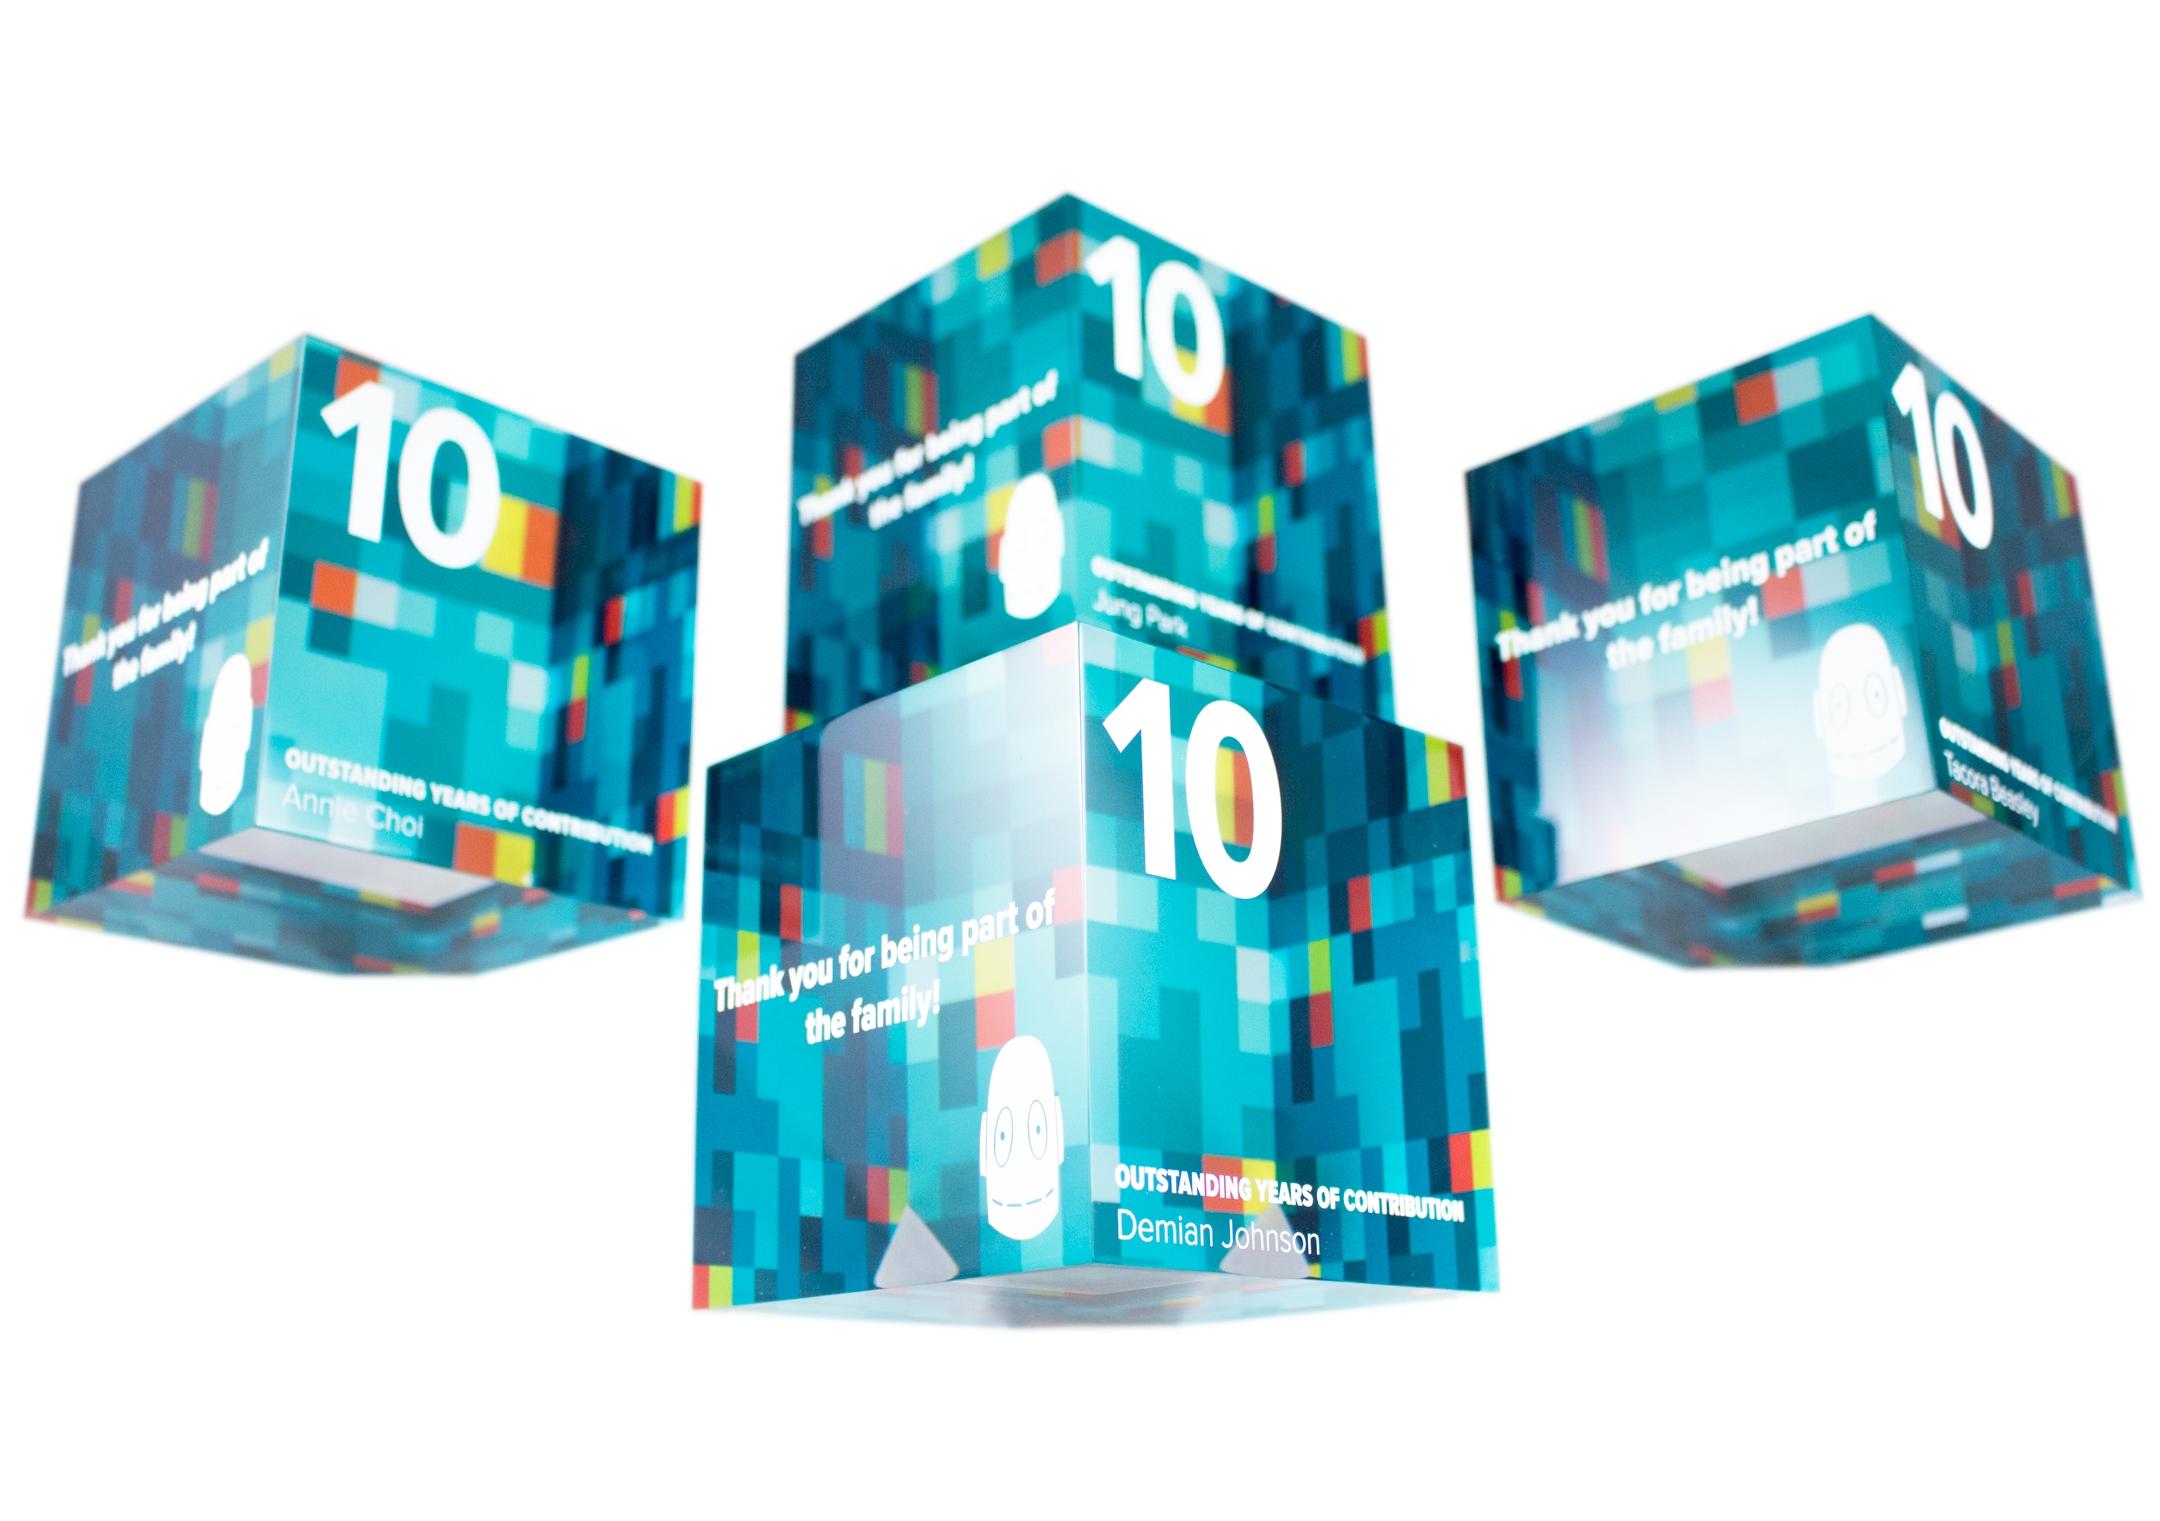 brainpop - cube acrylic awards